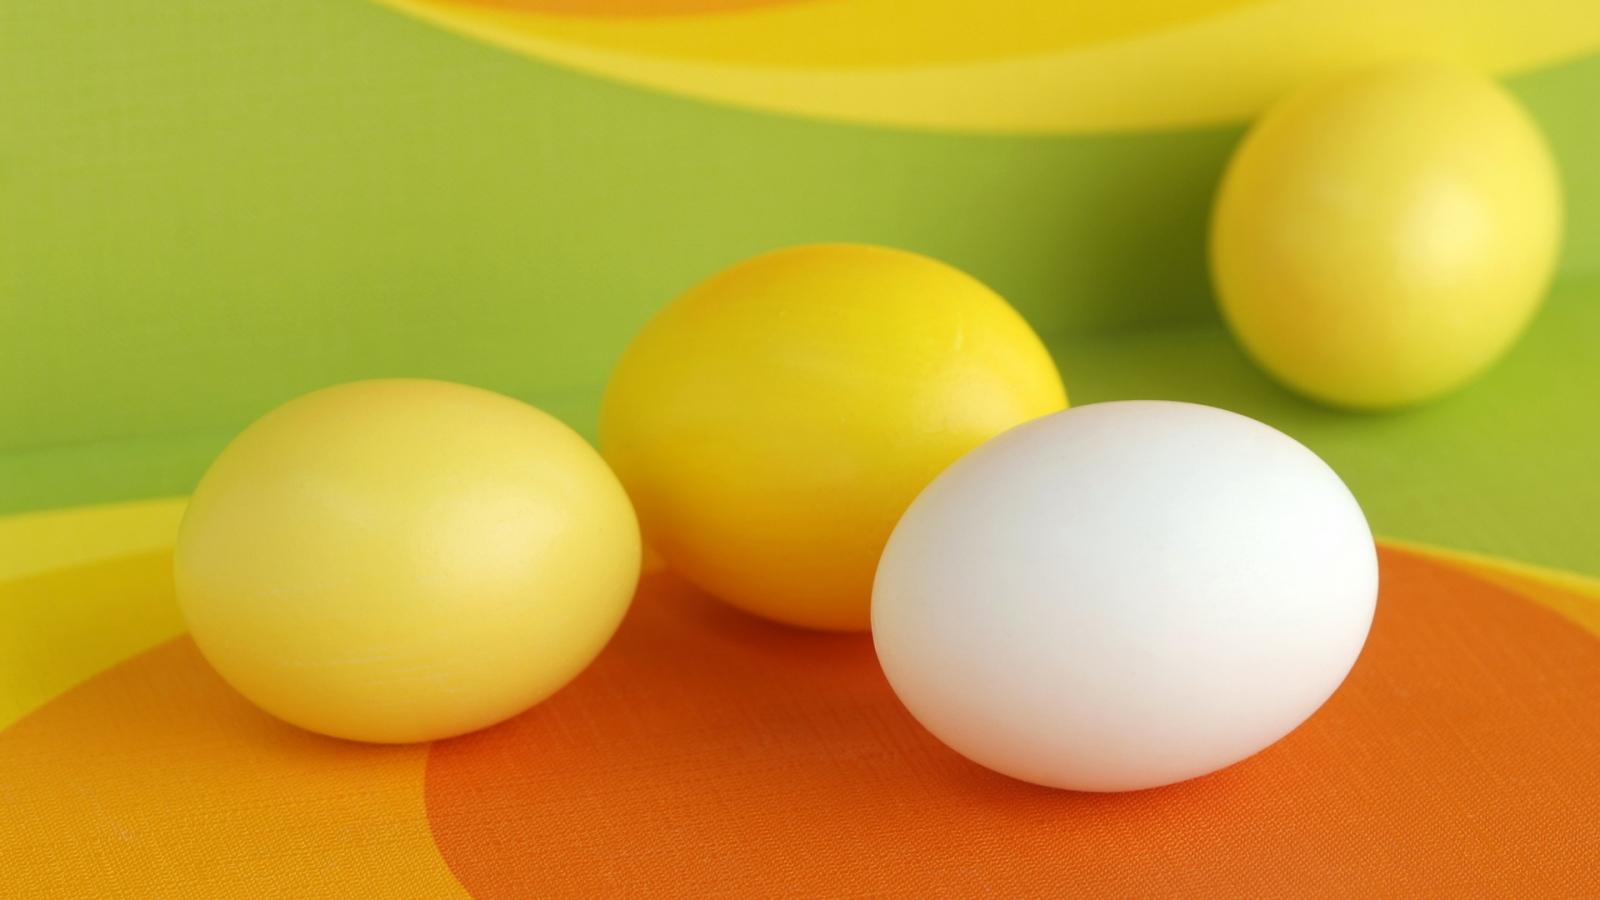 Download Eggs Wallpaper :